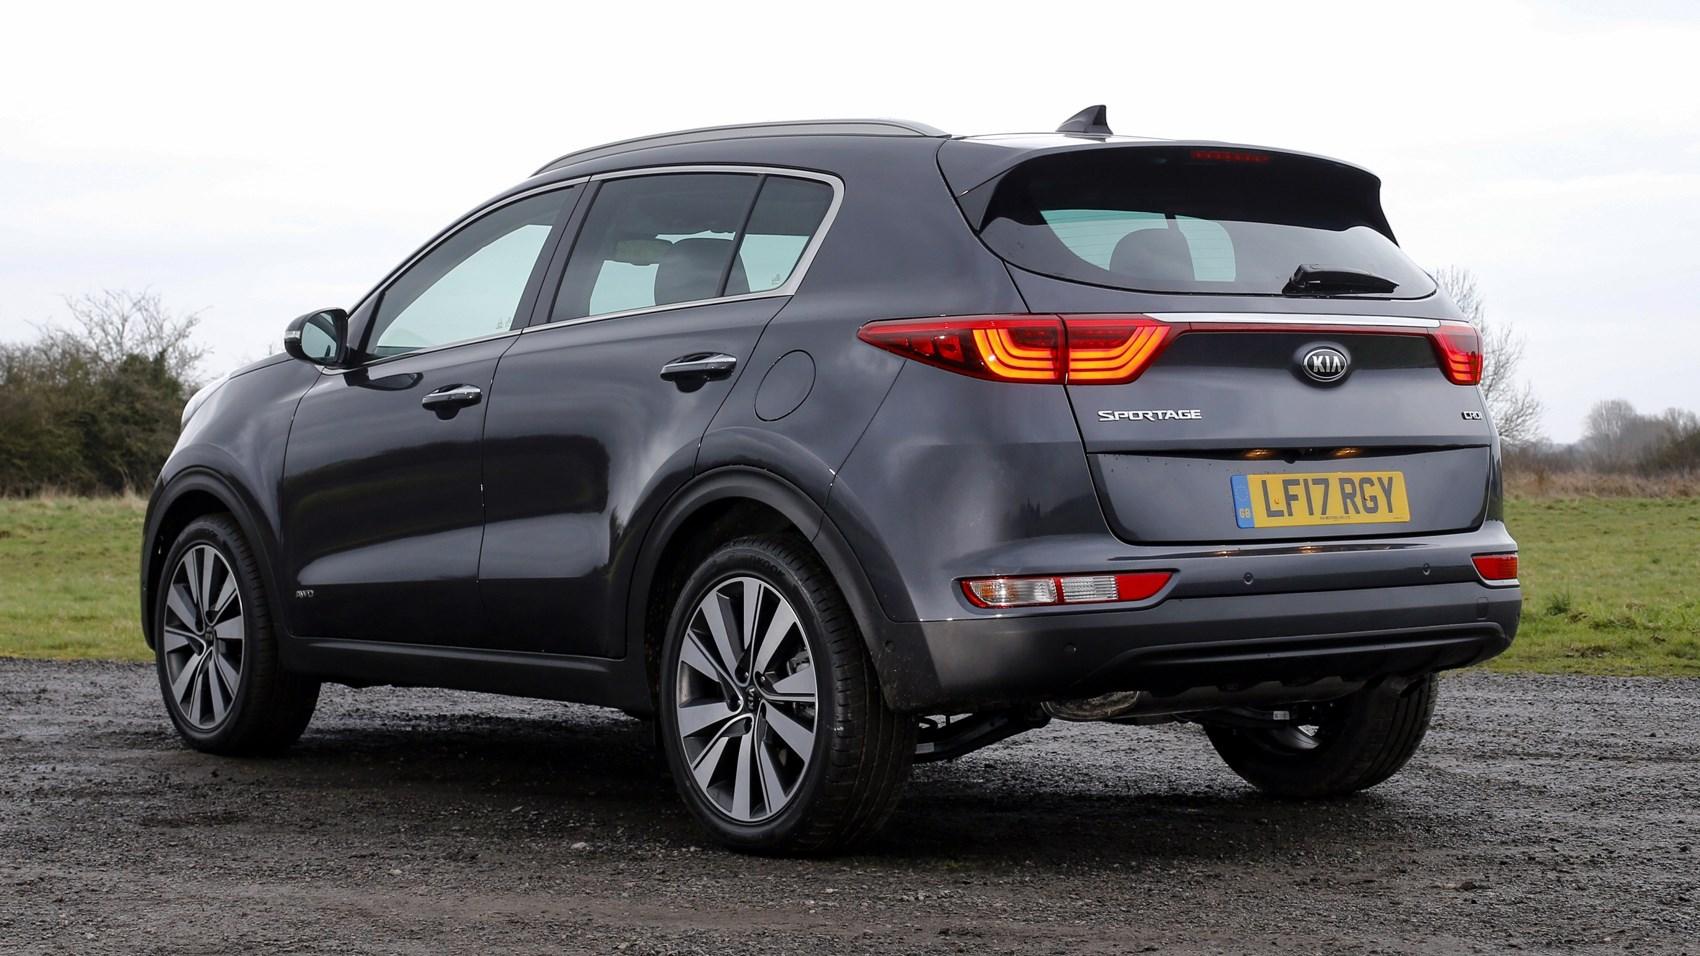 SUV modelo merkeenak 2019ko maiatza